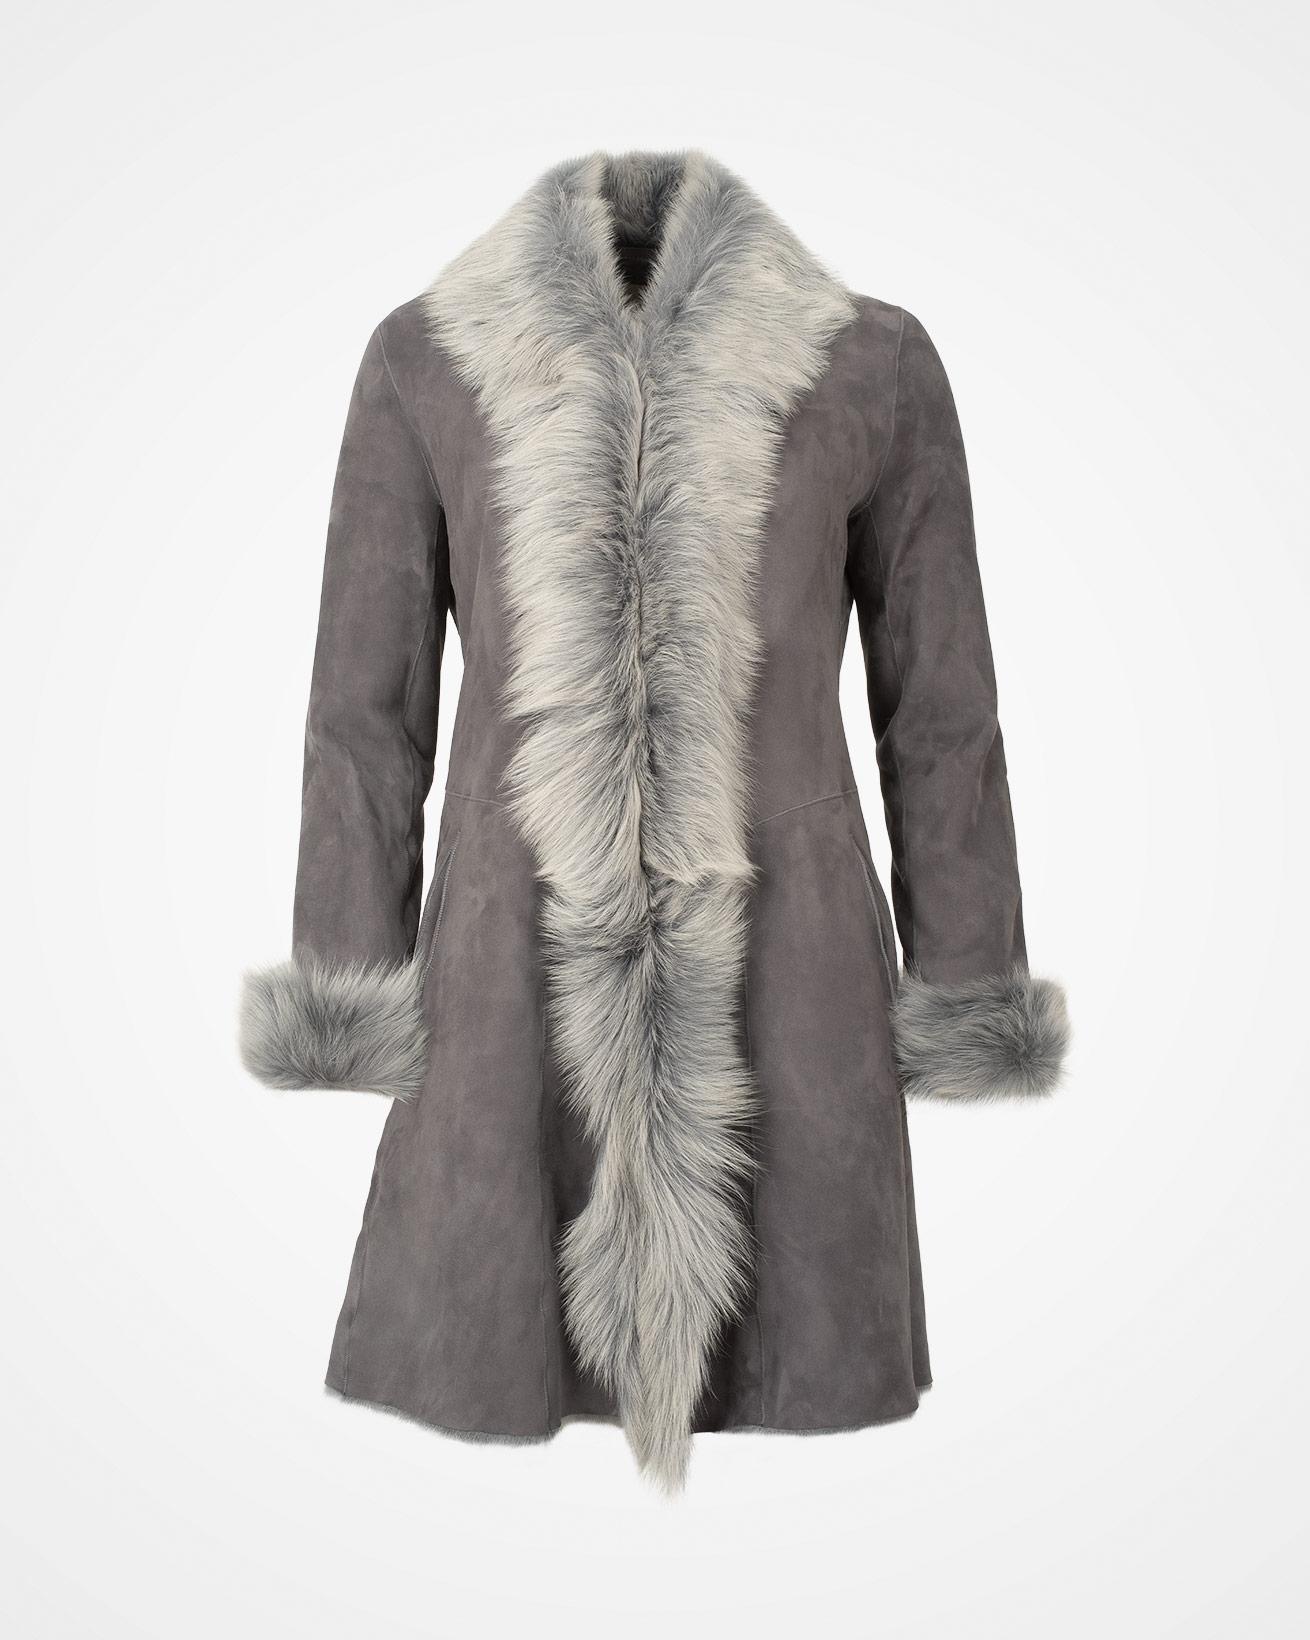 6020_3-4-toscana-trim-coat_grey_front.jpg